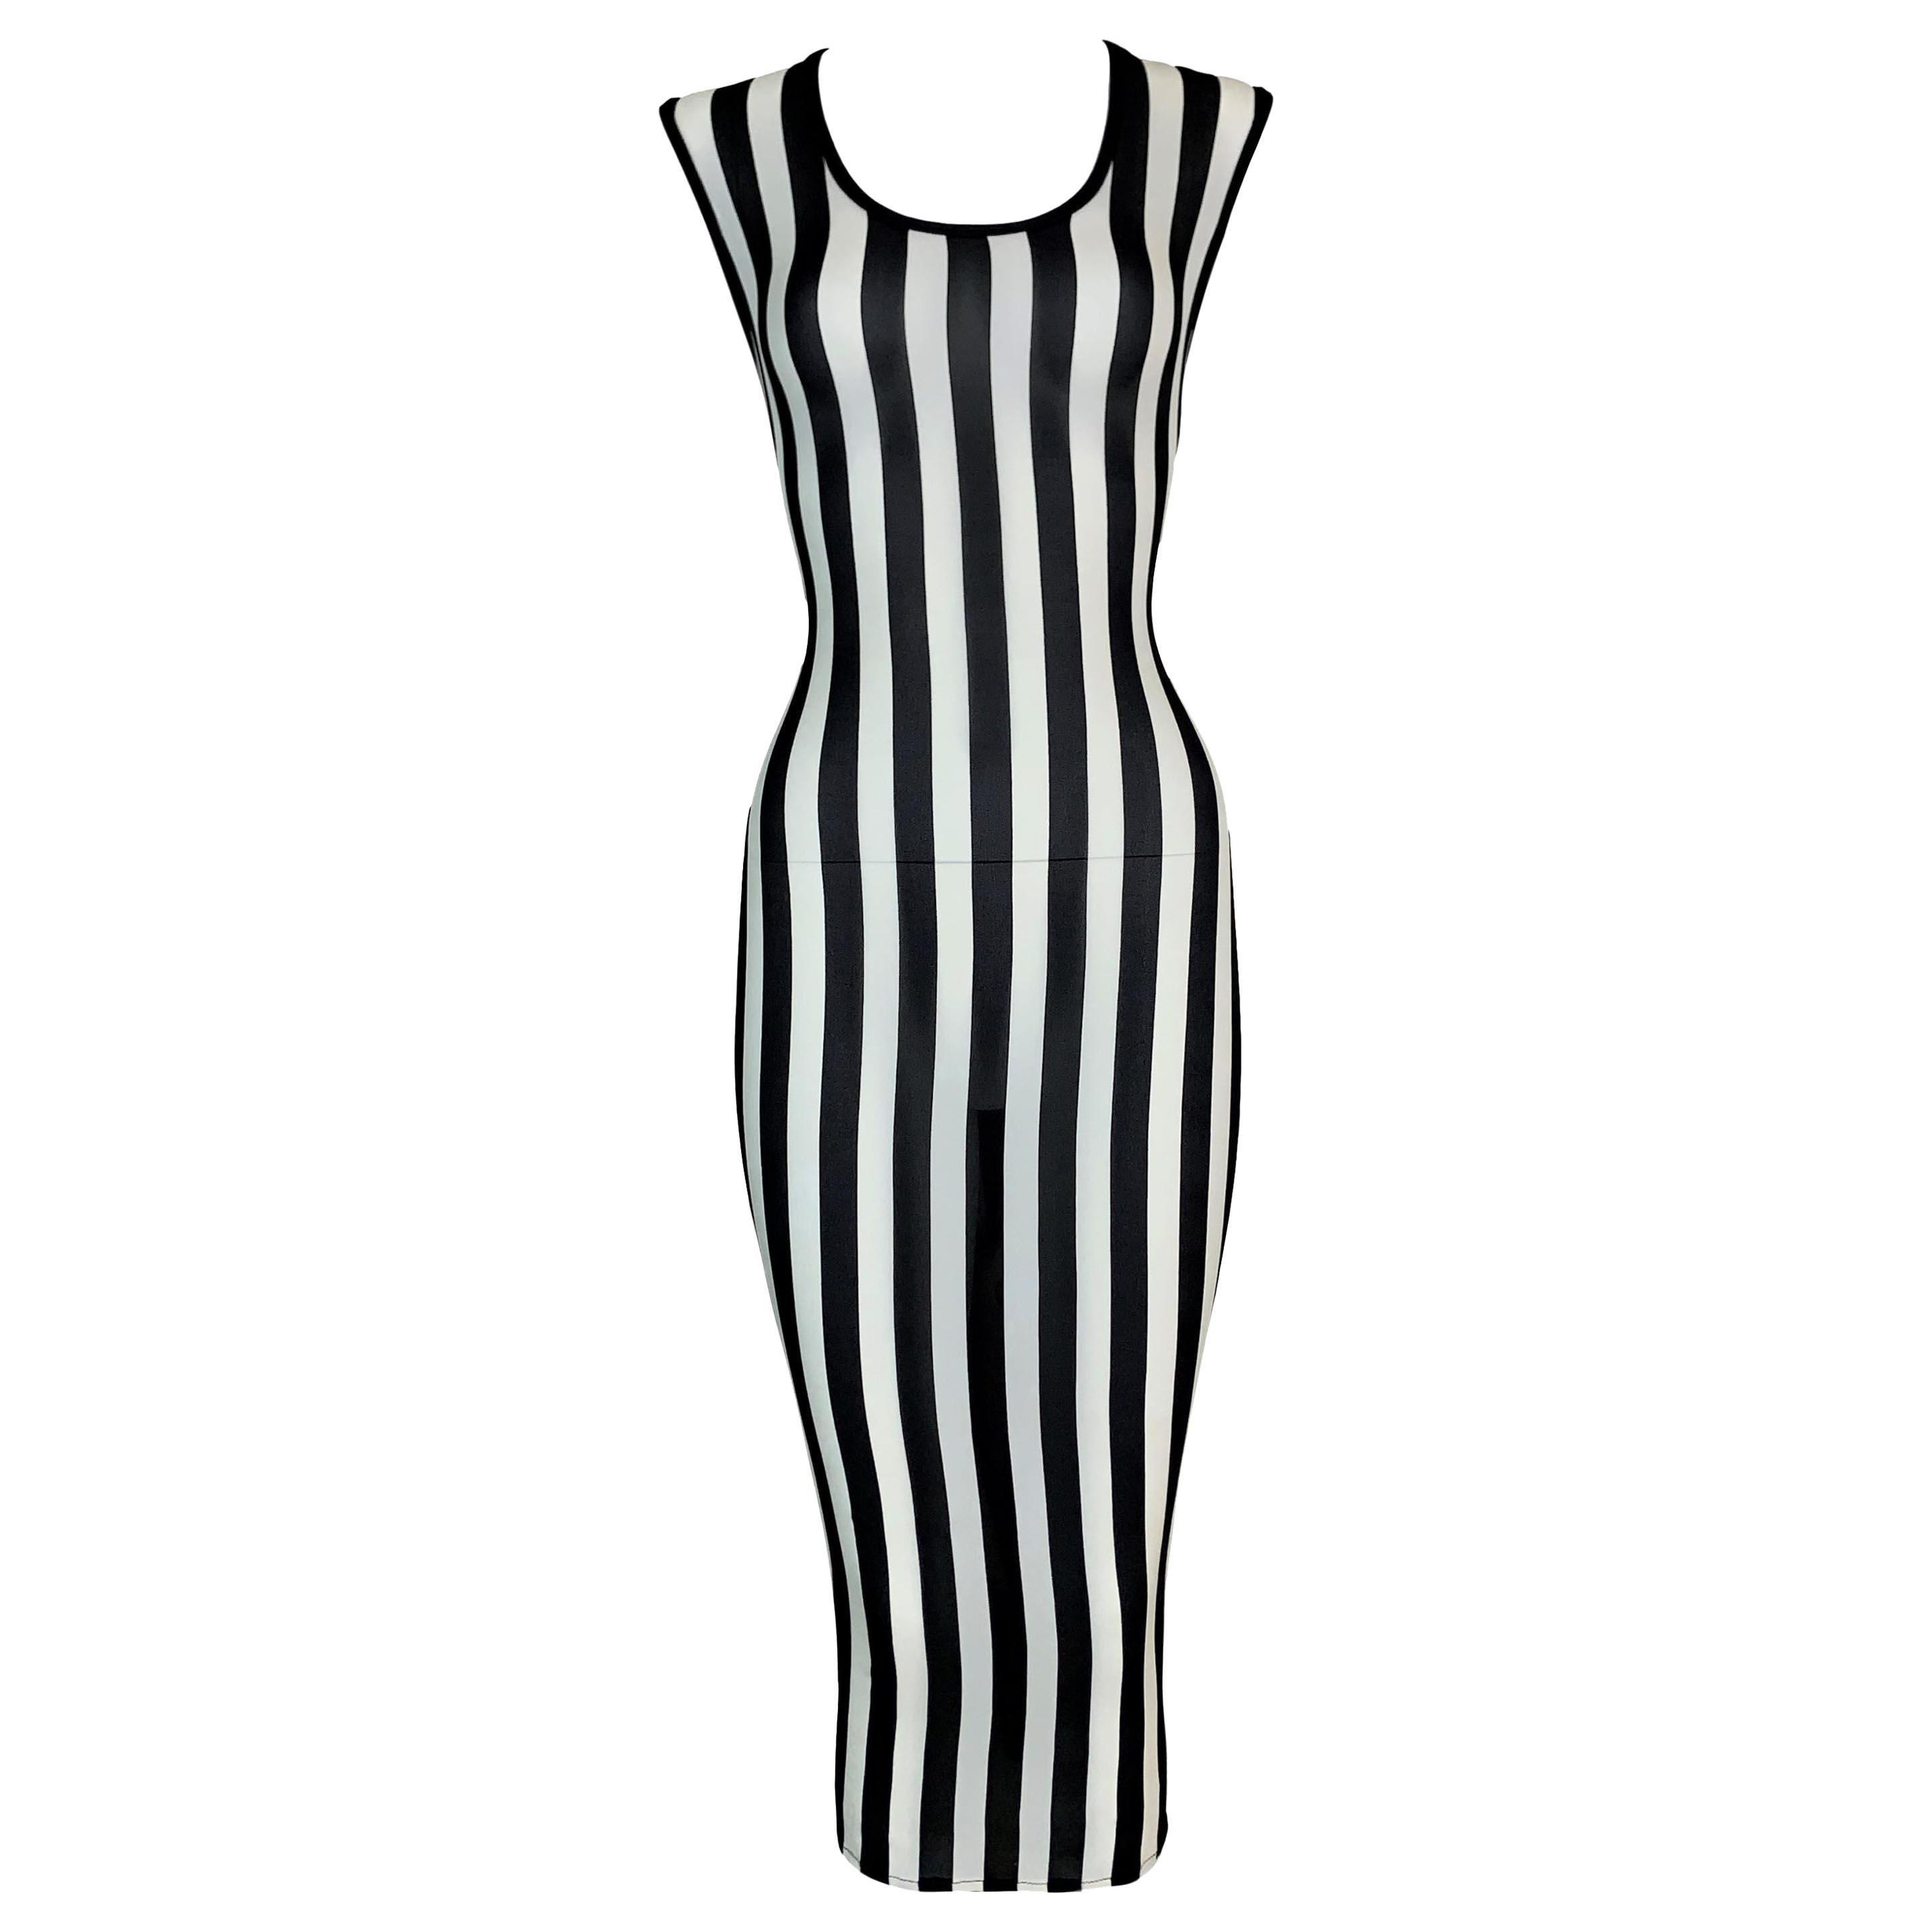 1993 Gianni Versace Sheer Stretch Silk Black & White Striped Wiggle Dress 44